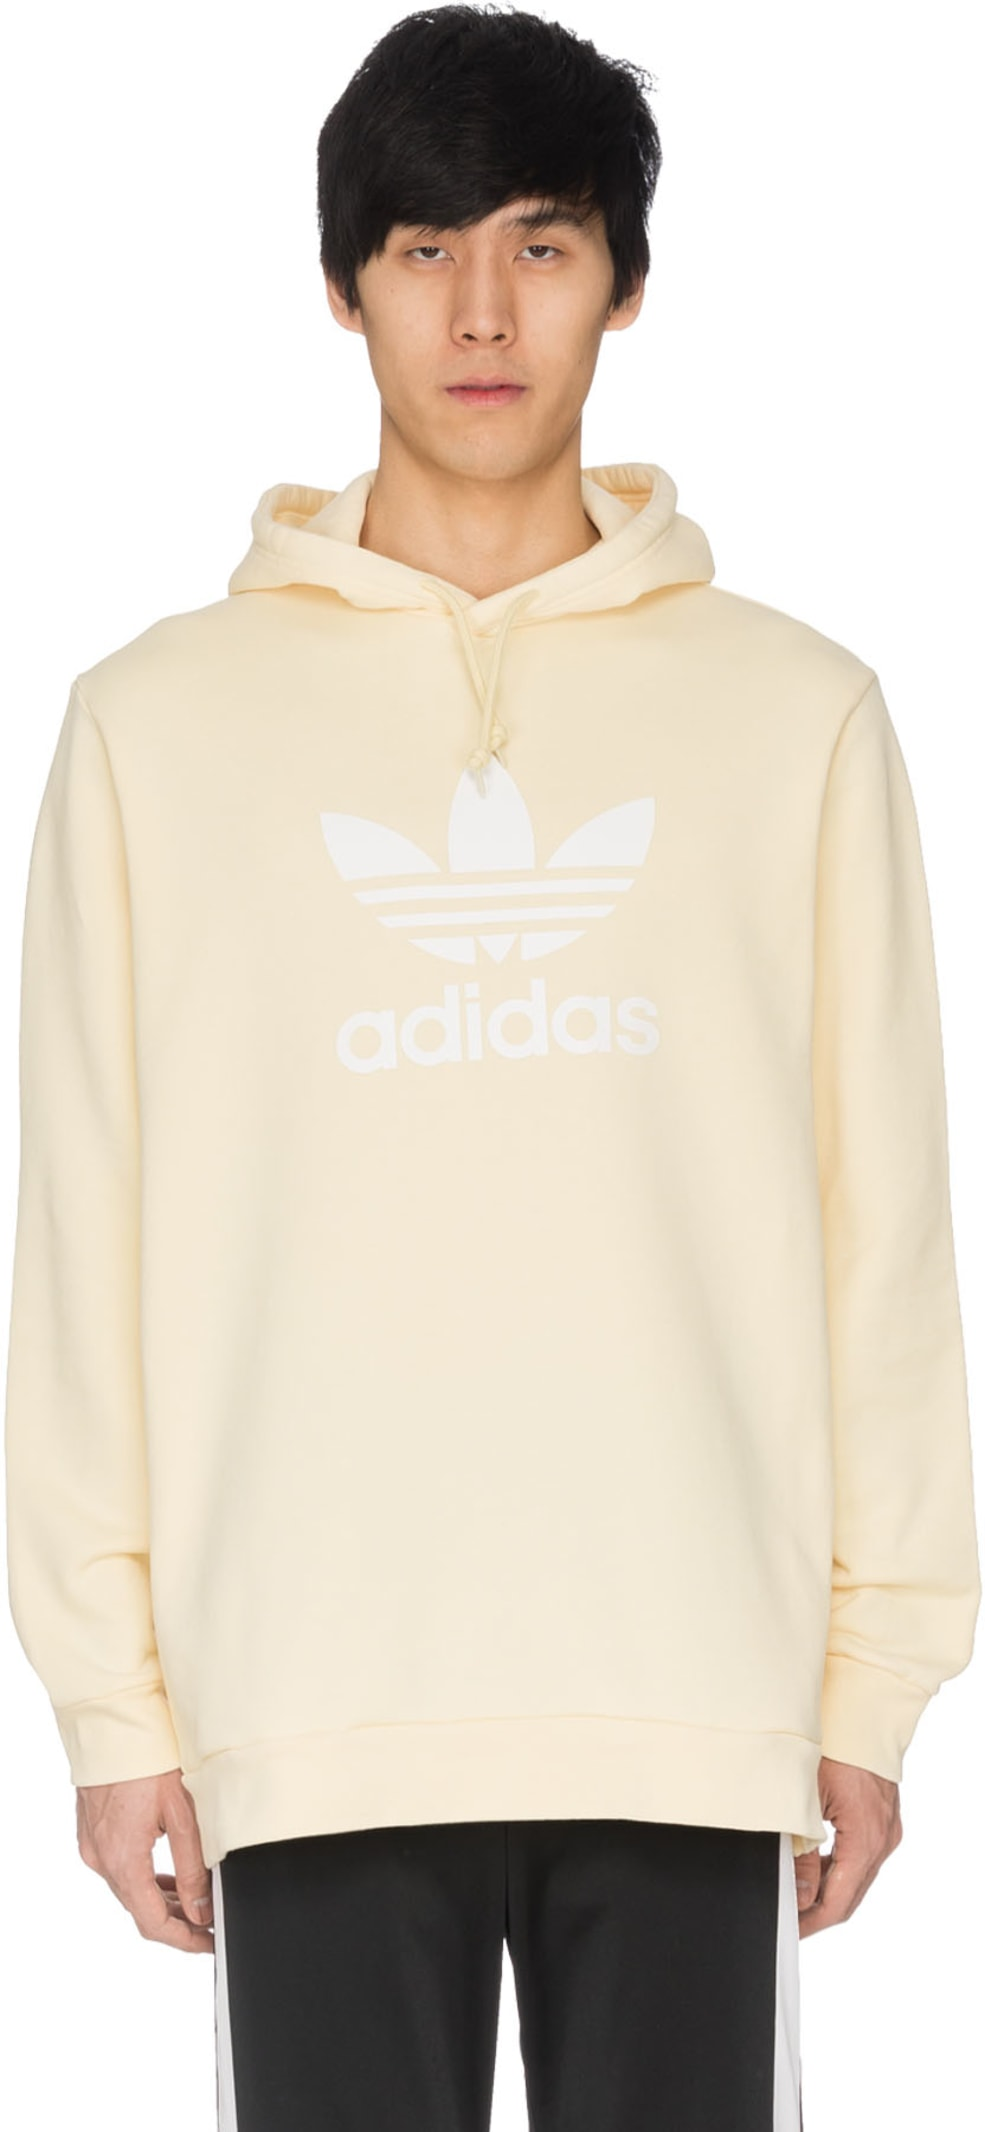 a5adcc7d1e3d adidas Originals  Trefoil Hoodie - Mist Sun